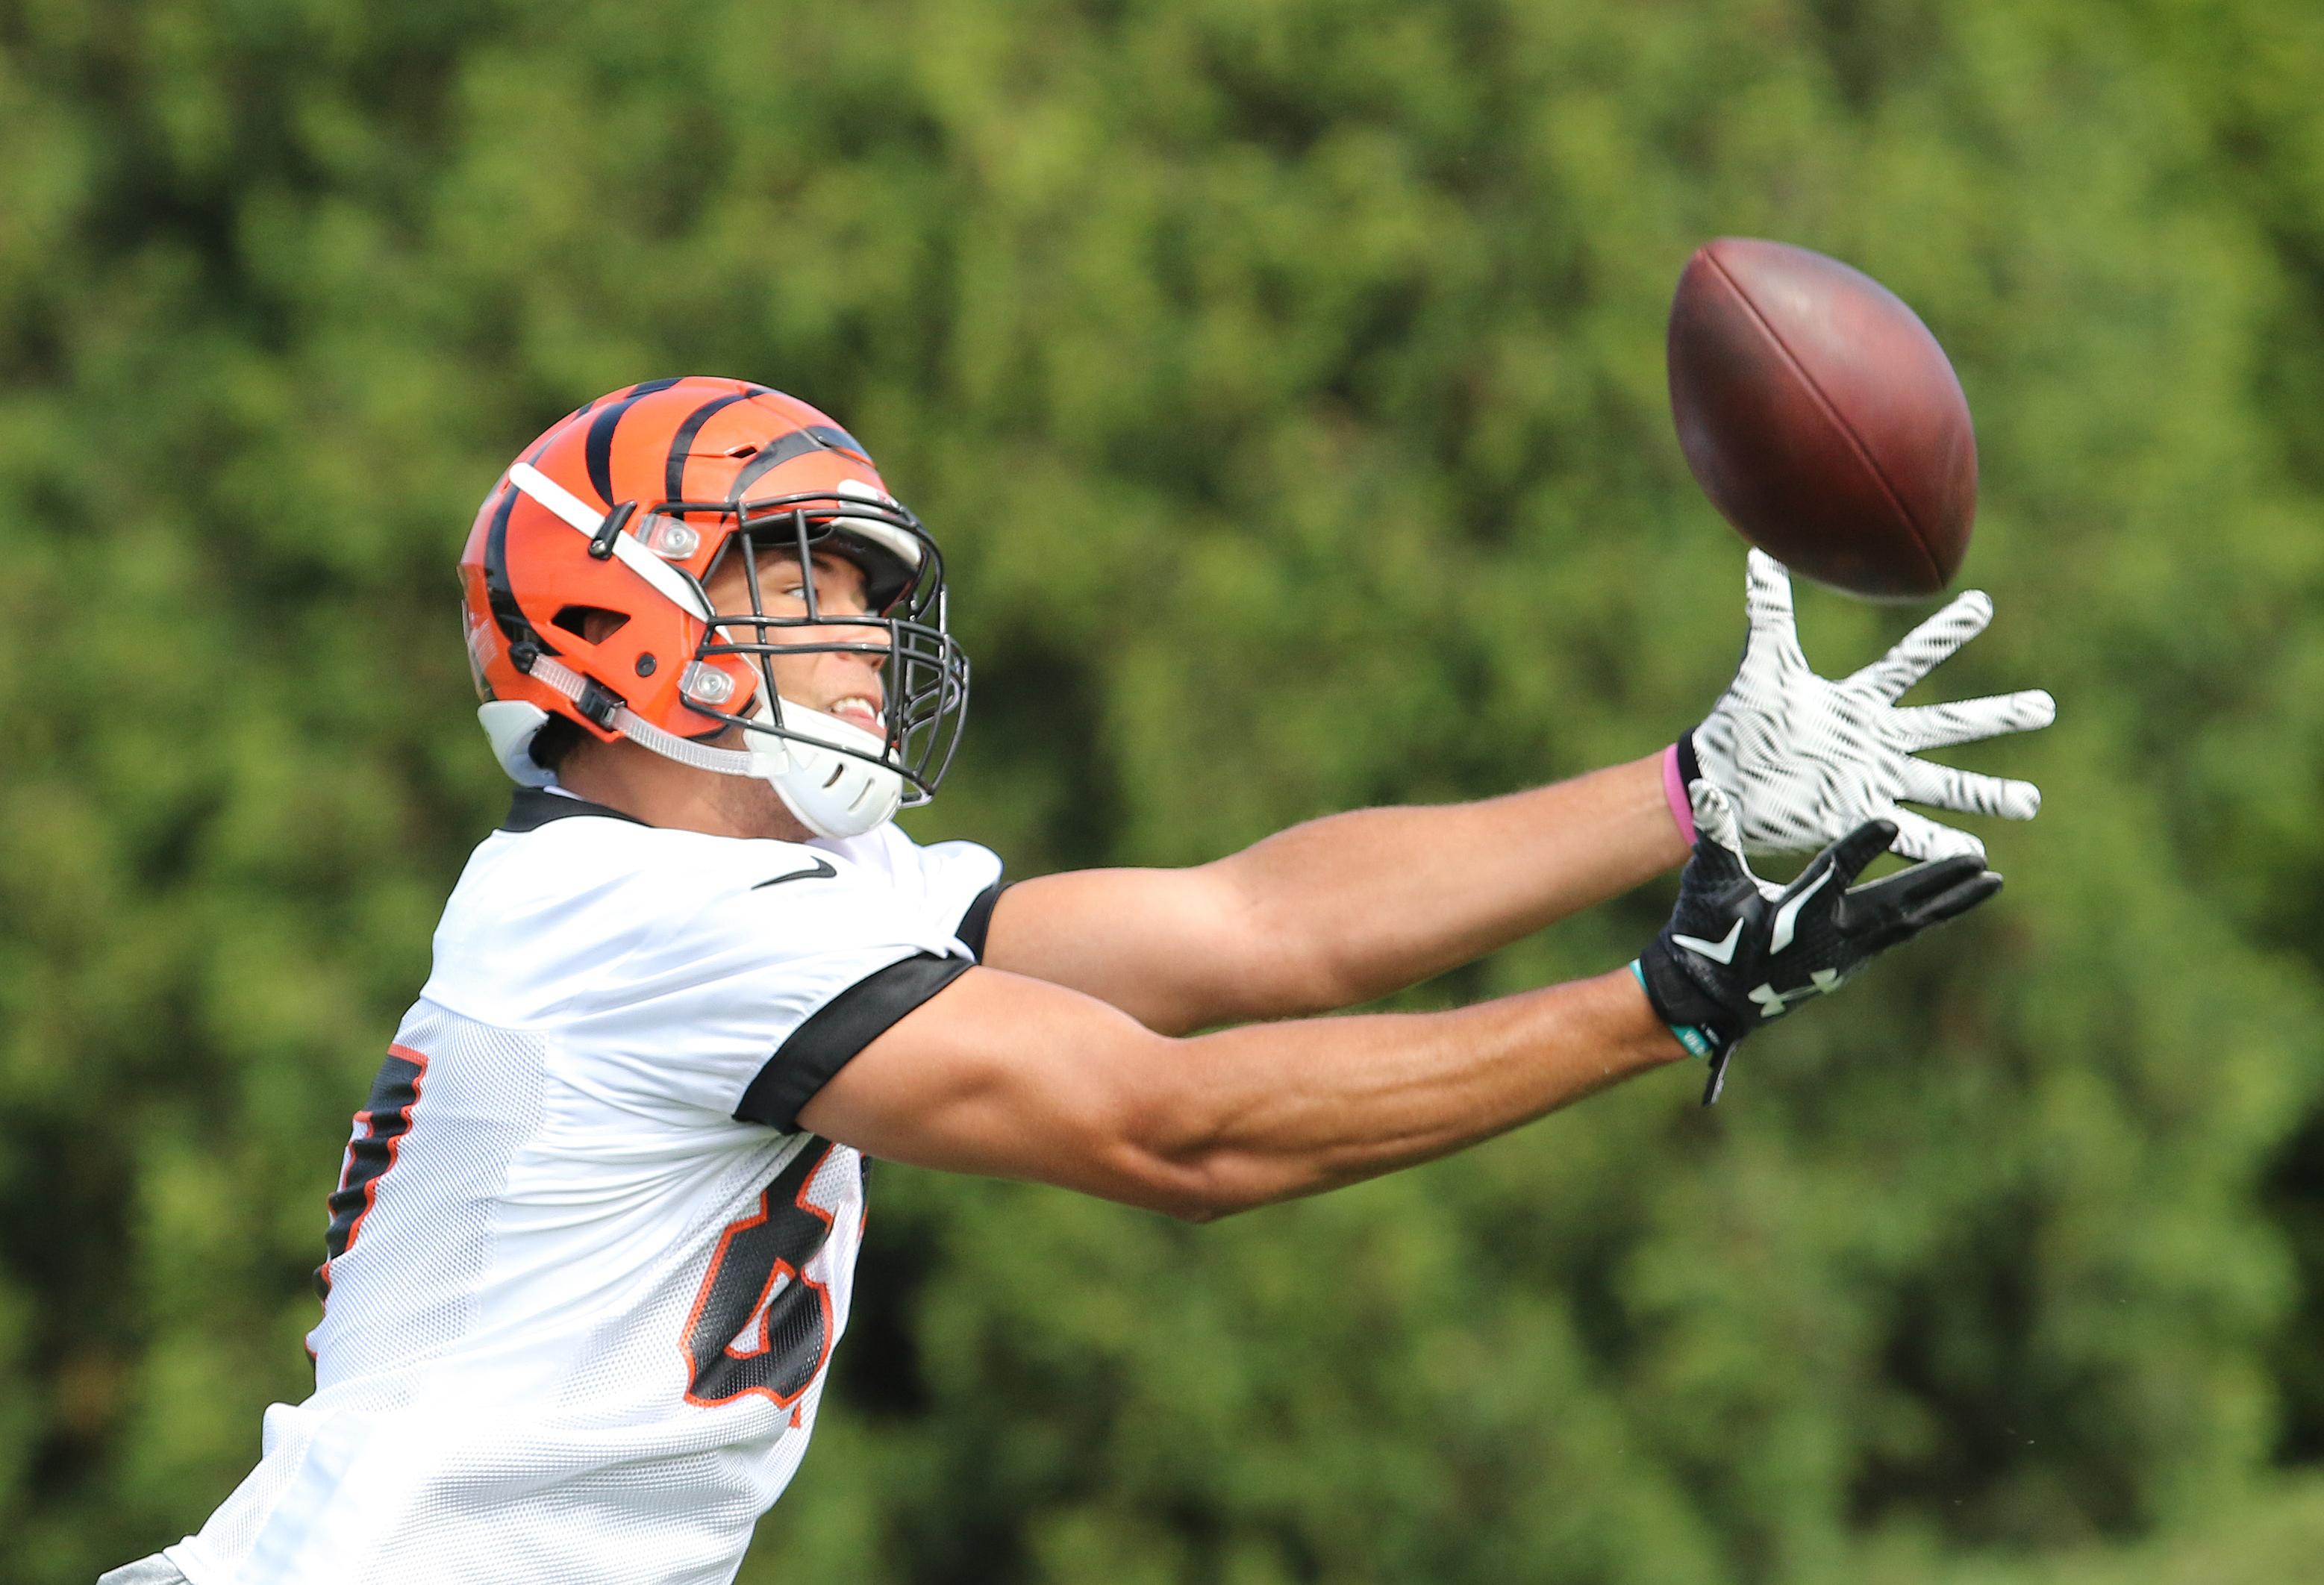 Cincinnati Bengals C.J. Uzomah catches a pass during their NFL football rookie minicamp Saturday, May 9, 2015, in Cincinnati. (AP Photo/Gary Landers)